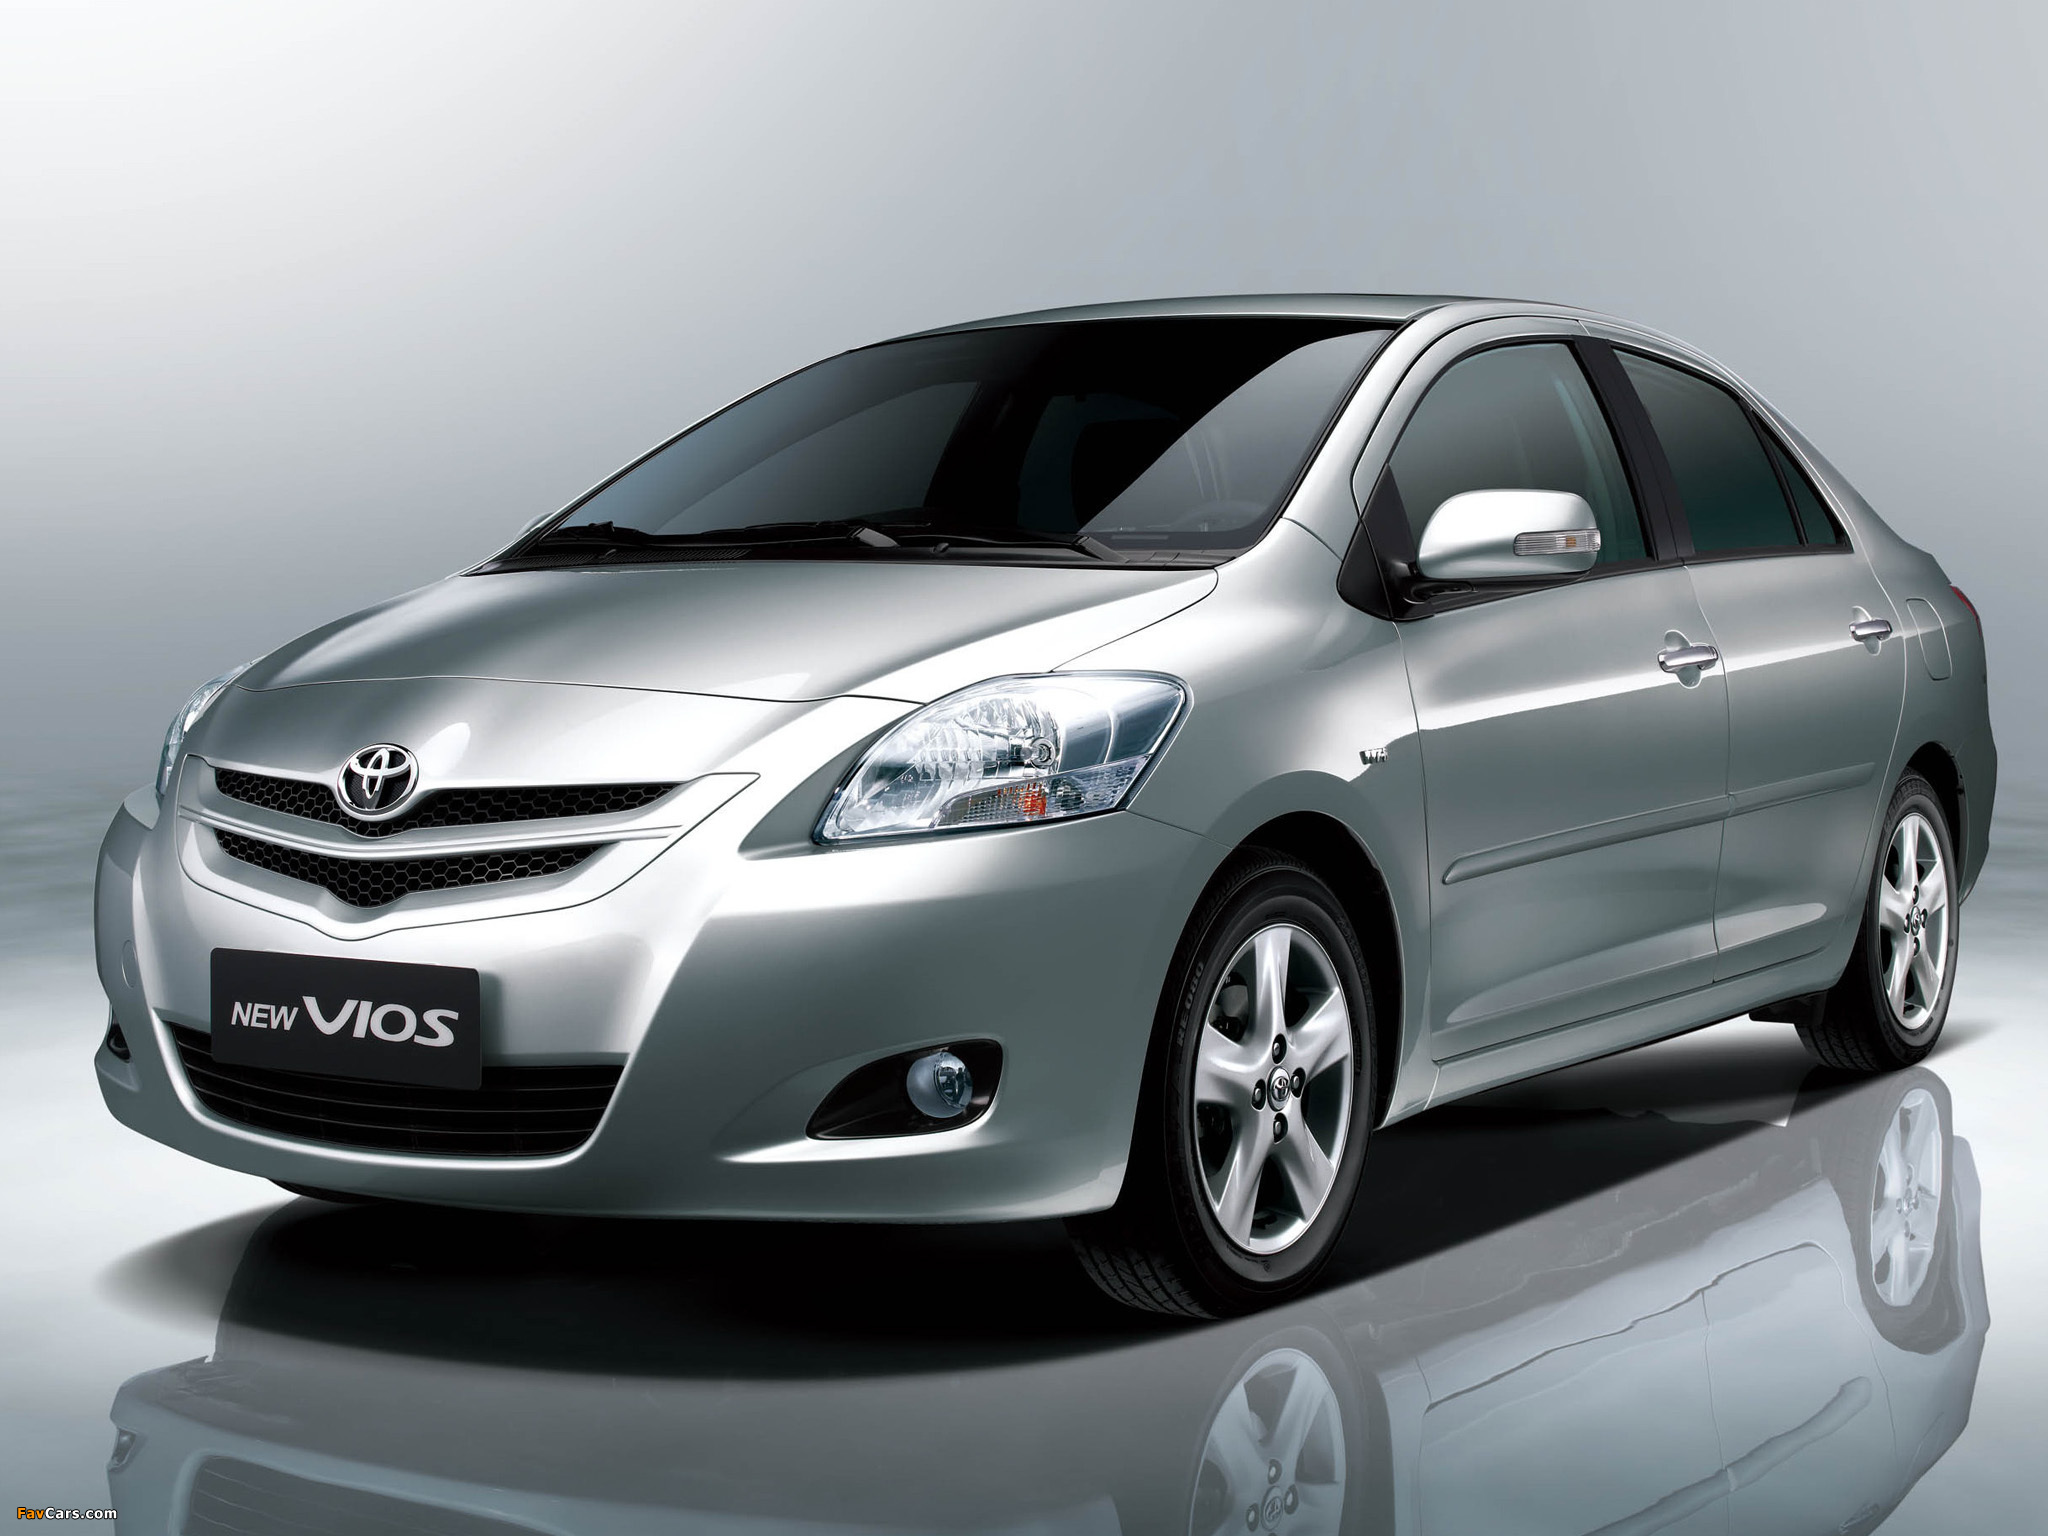 Kekurangan Toyota Vios 2007 Harga